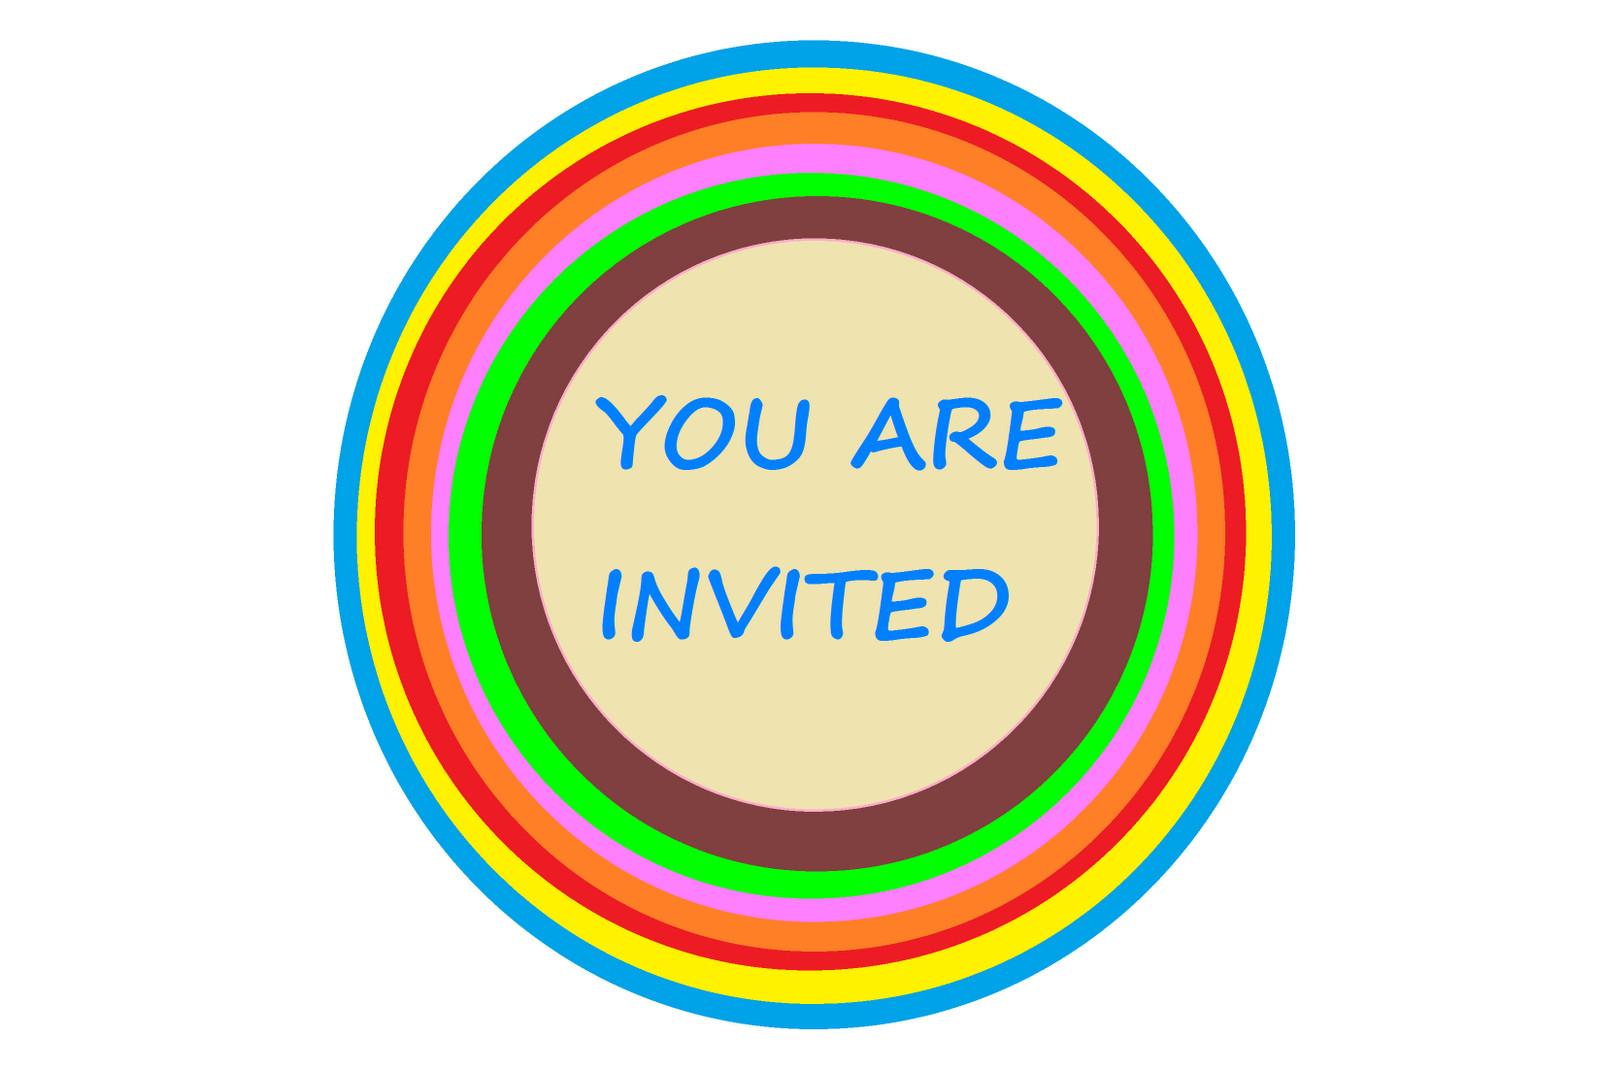 You are Invited Template You are Invited Templates